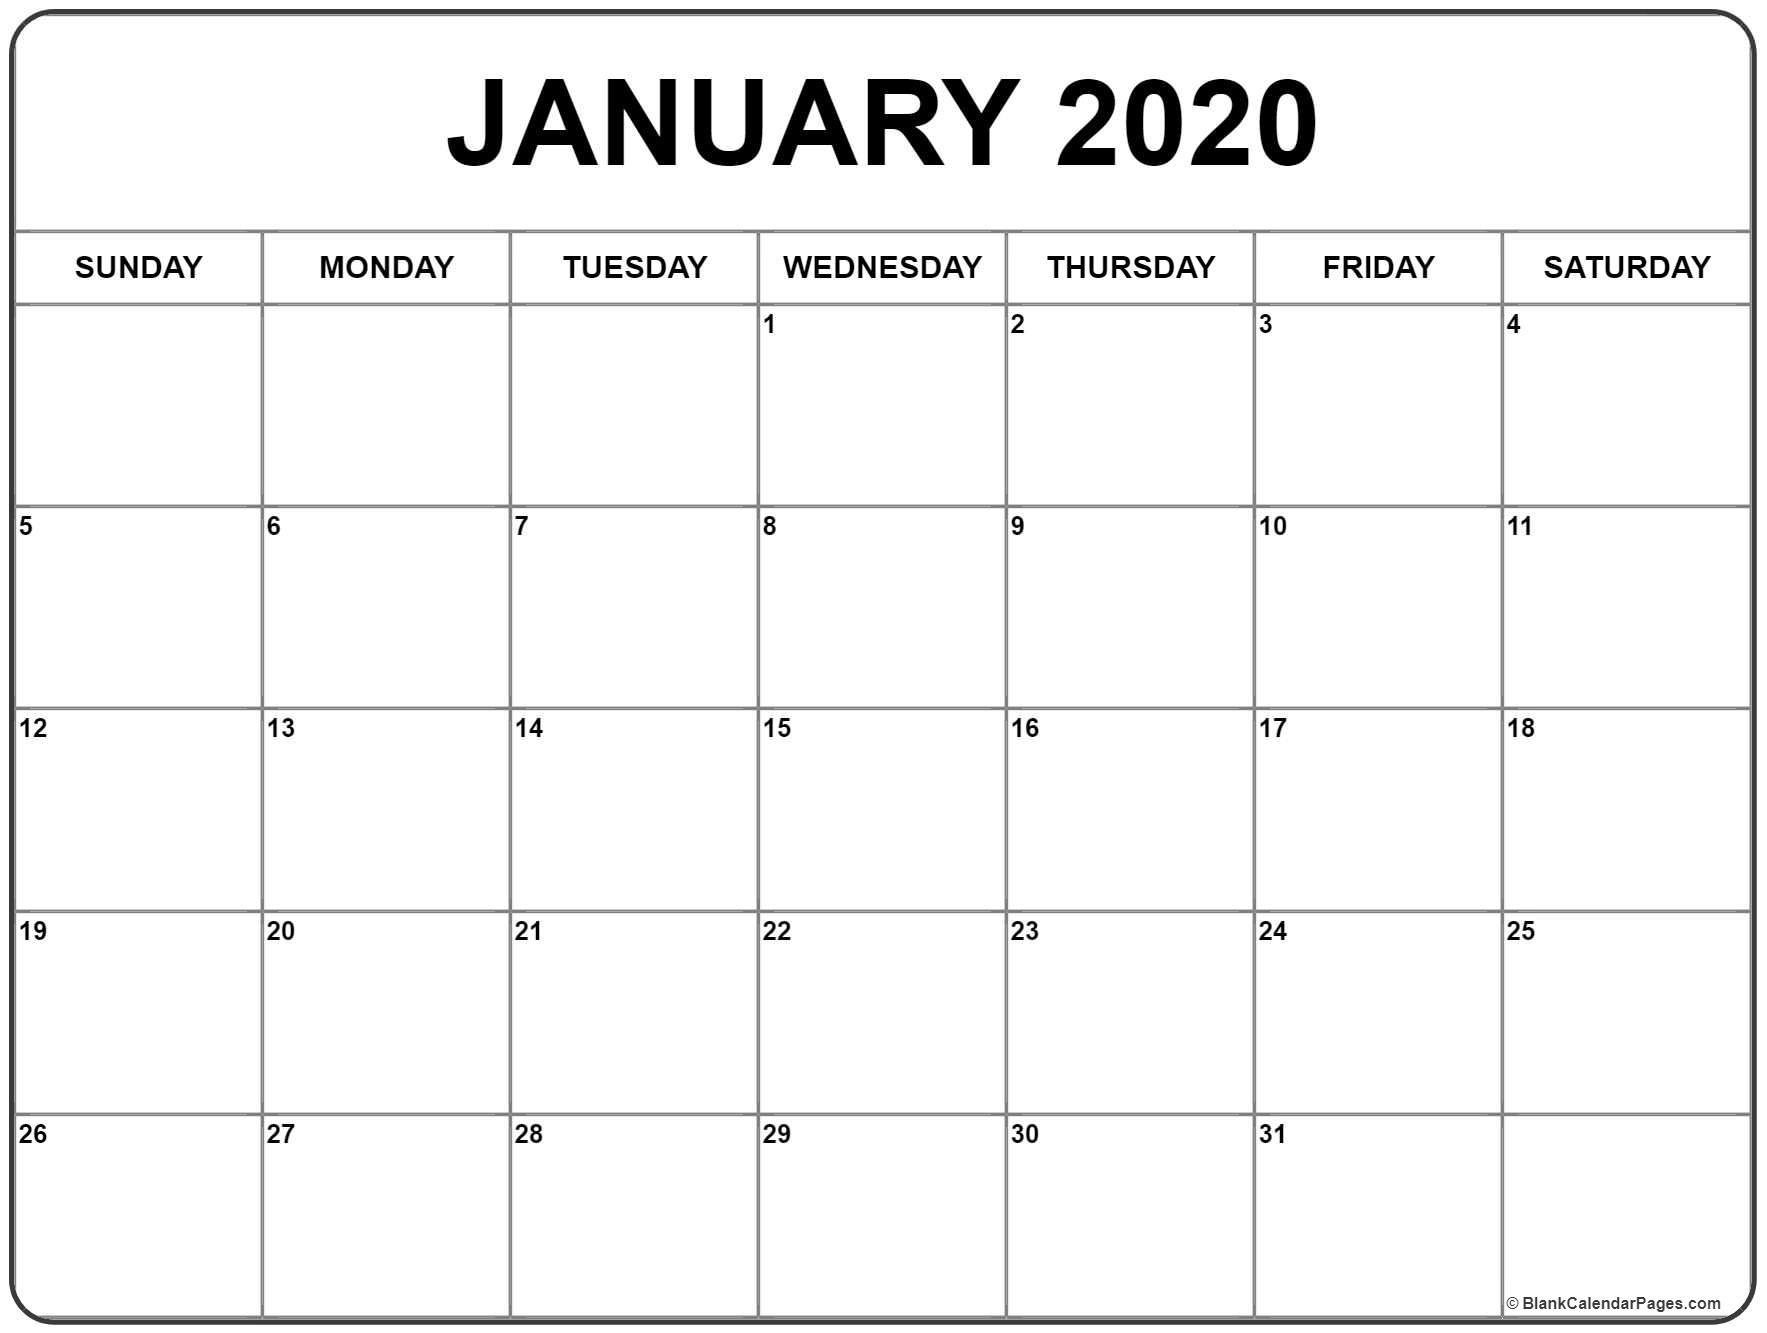 Islamic Calendar 2020 – Printable Week Calendar-January 2020 Islamic Calendar